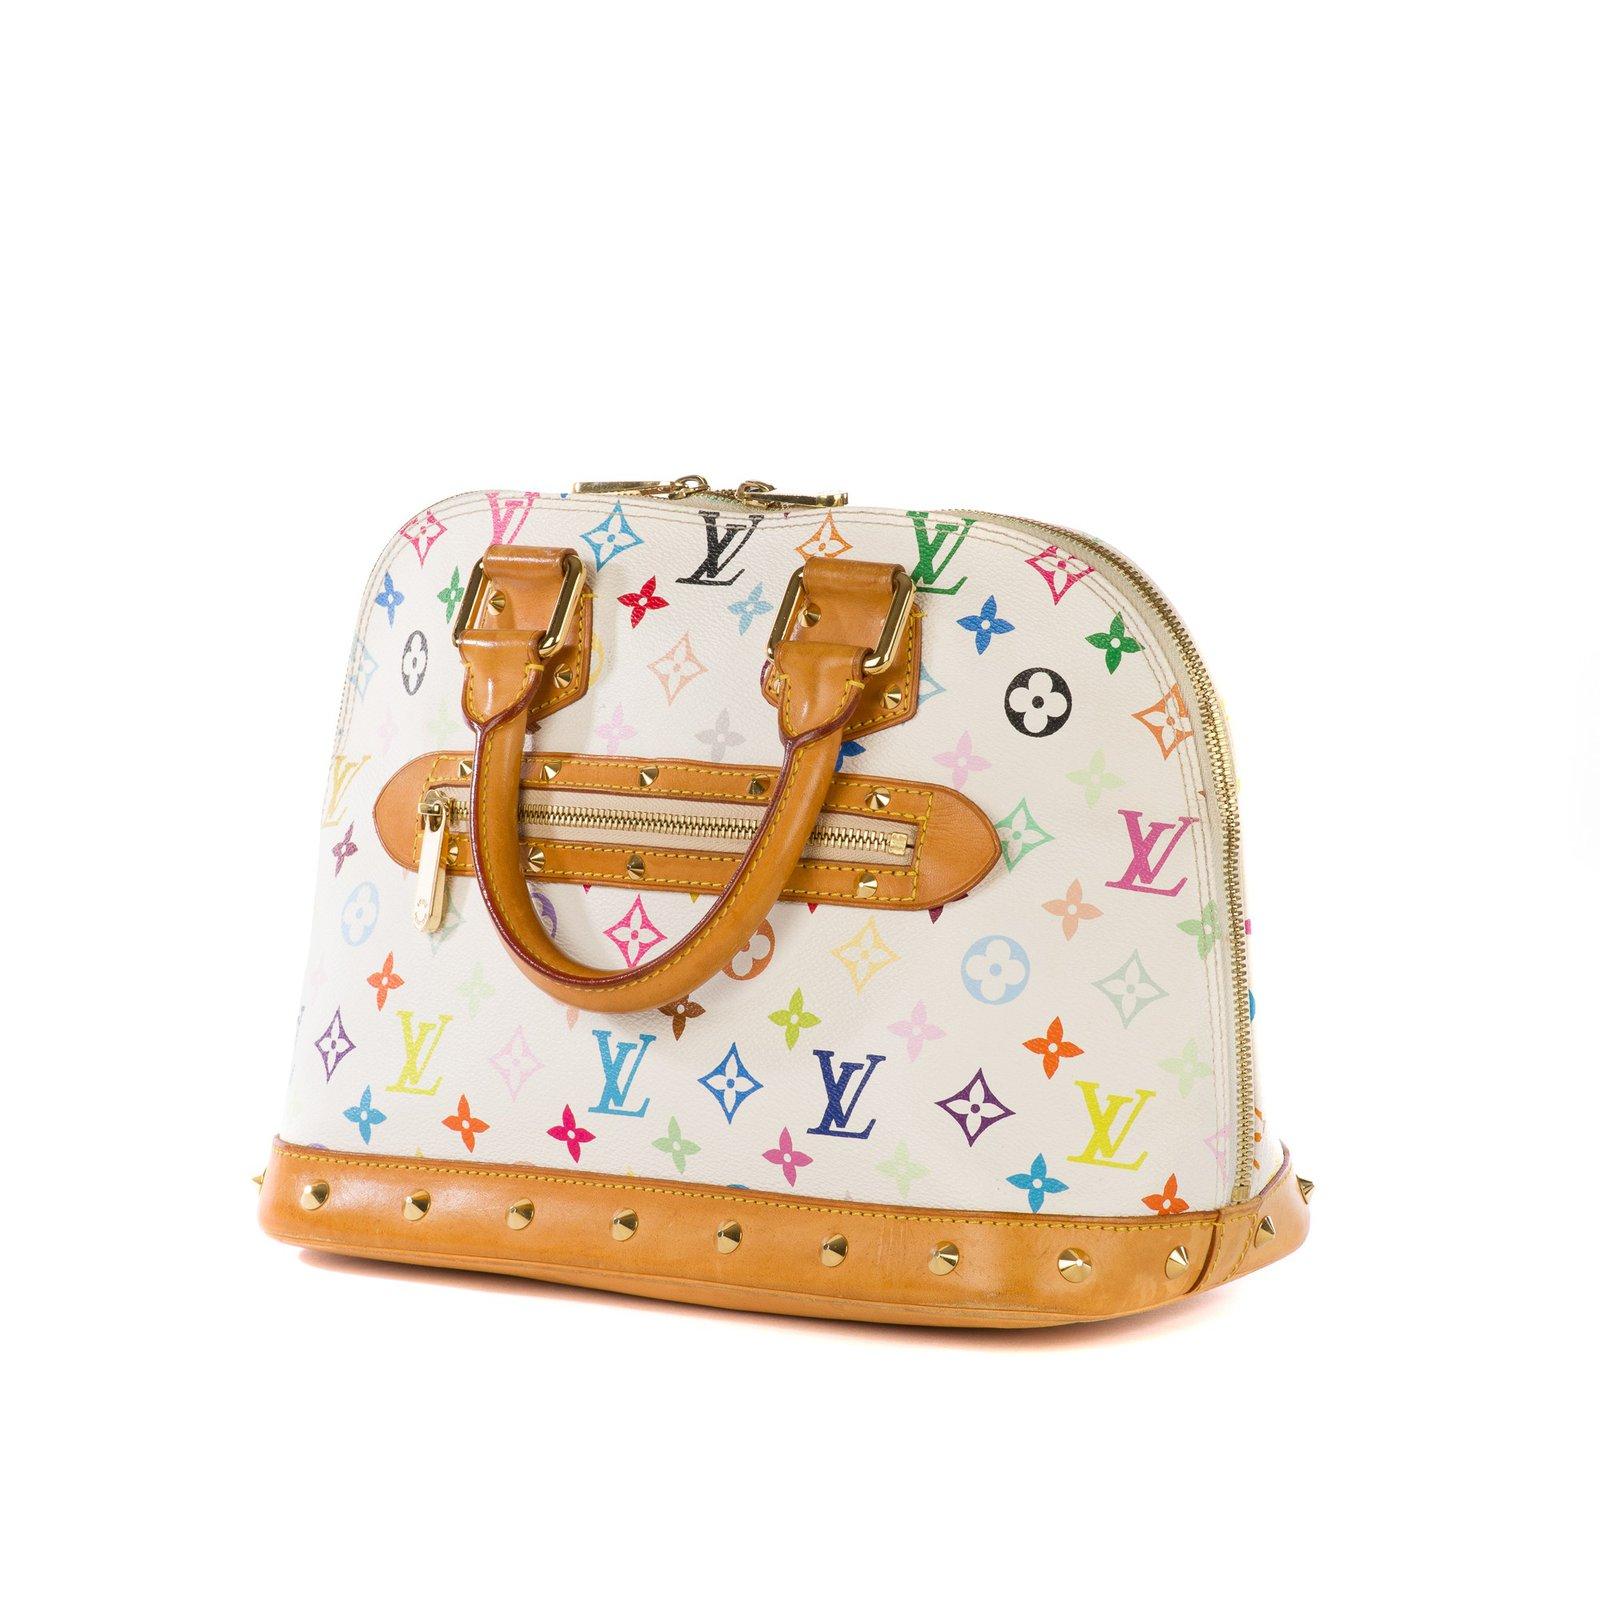 c5cb76a2f Louis Vuitton Louis Vuitton Alma Collector Murakami white multicolor bag! Handbags  Leather,Cloth White,Multiple colors ref.102738 - Joli Closet